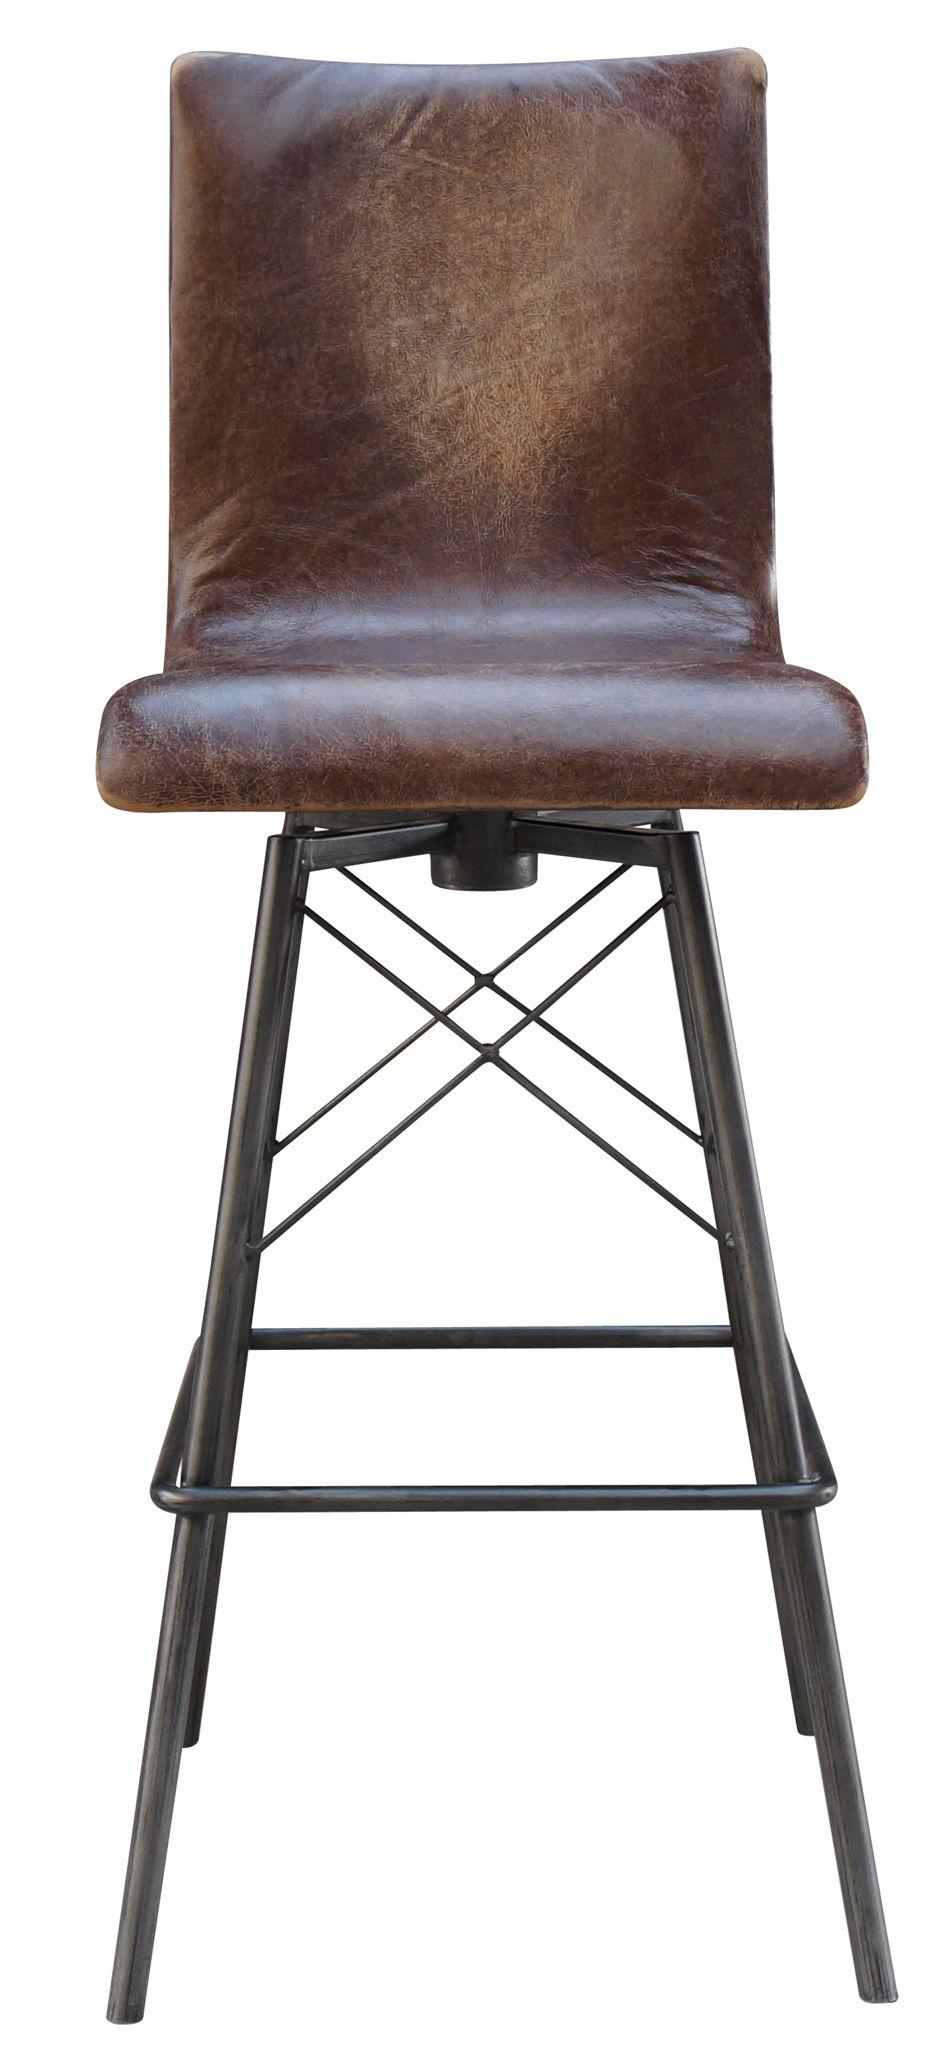 Jenna Swivel Leather Bar Stool Leather Bar Stools With Back R38